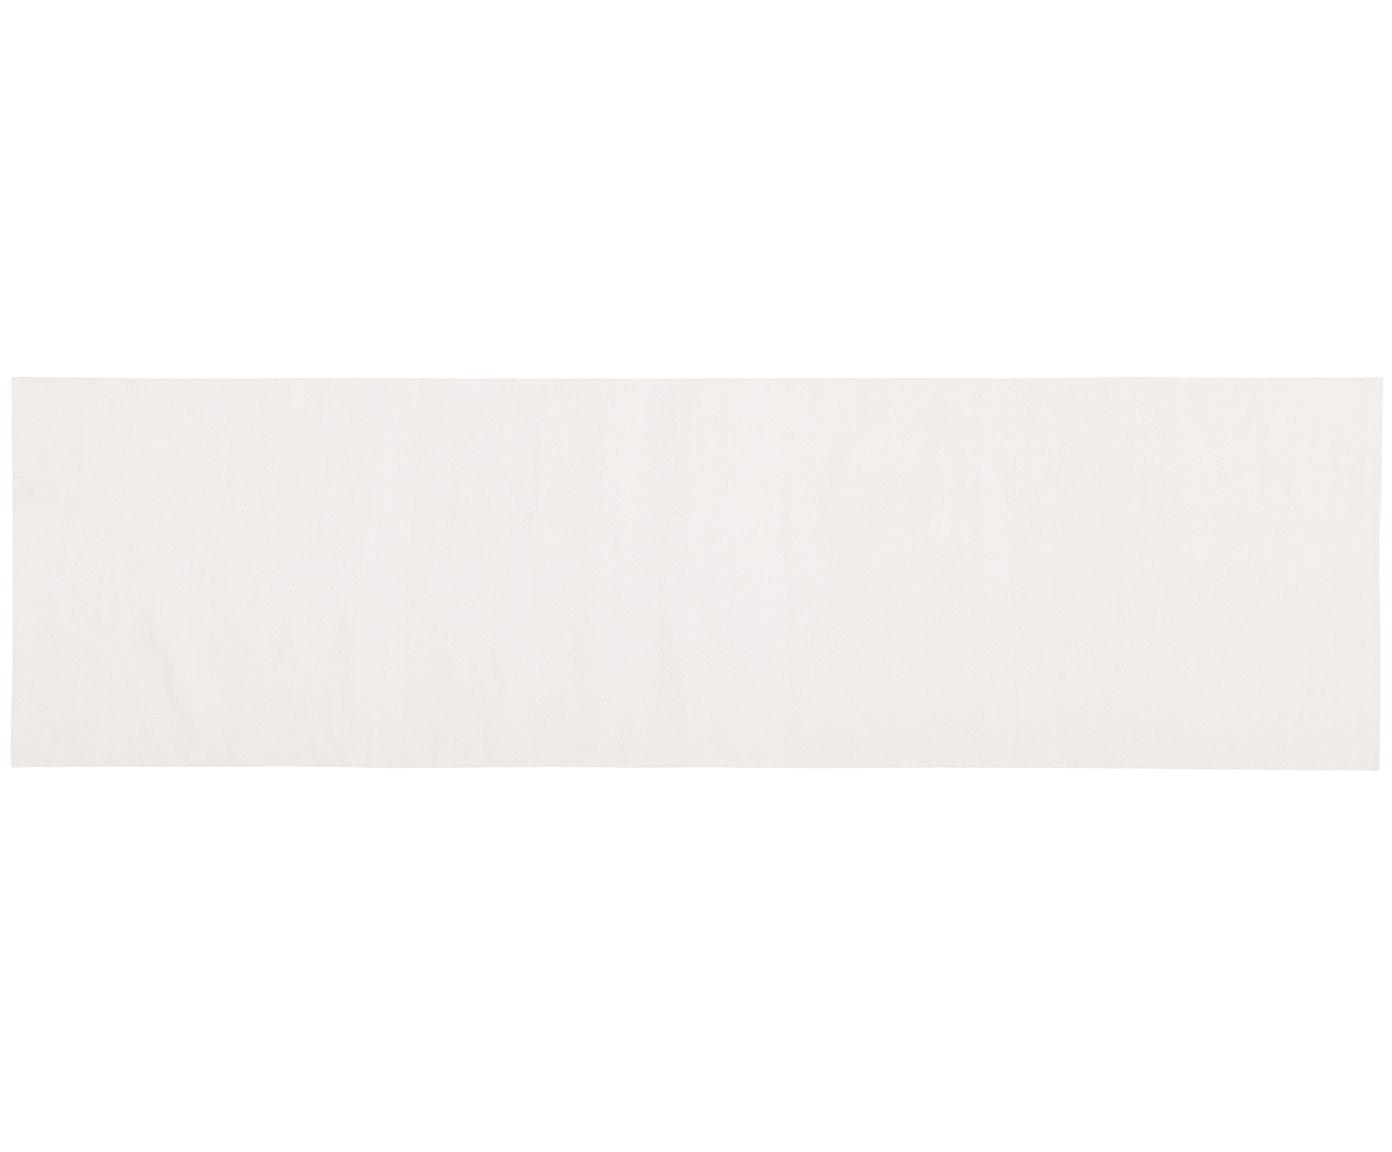 Alfombra artesanal de algodón Agneta, Algodón, Blanco crema, An 70 x L 250 cm